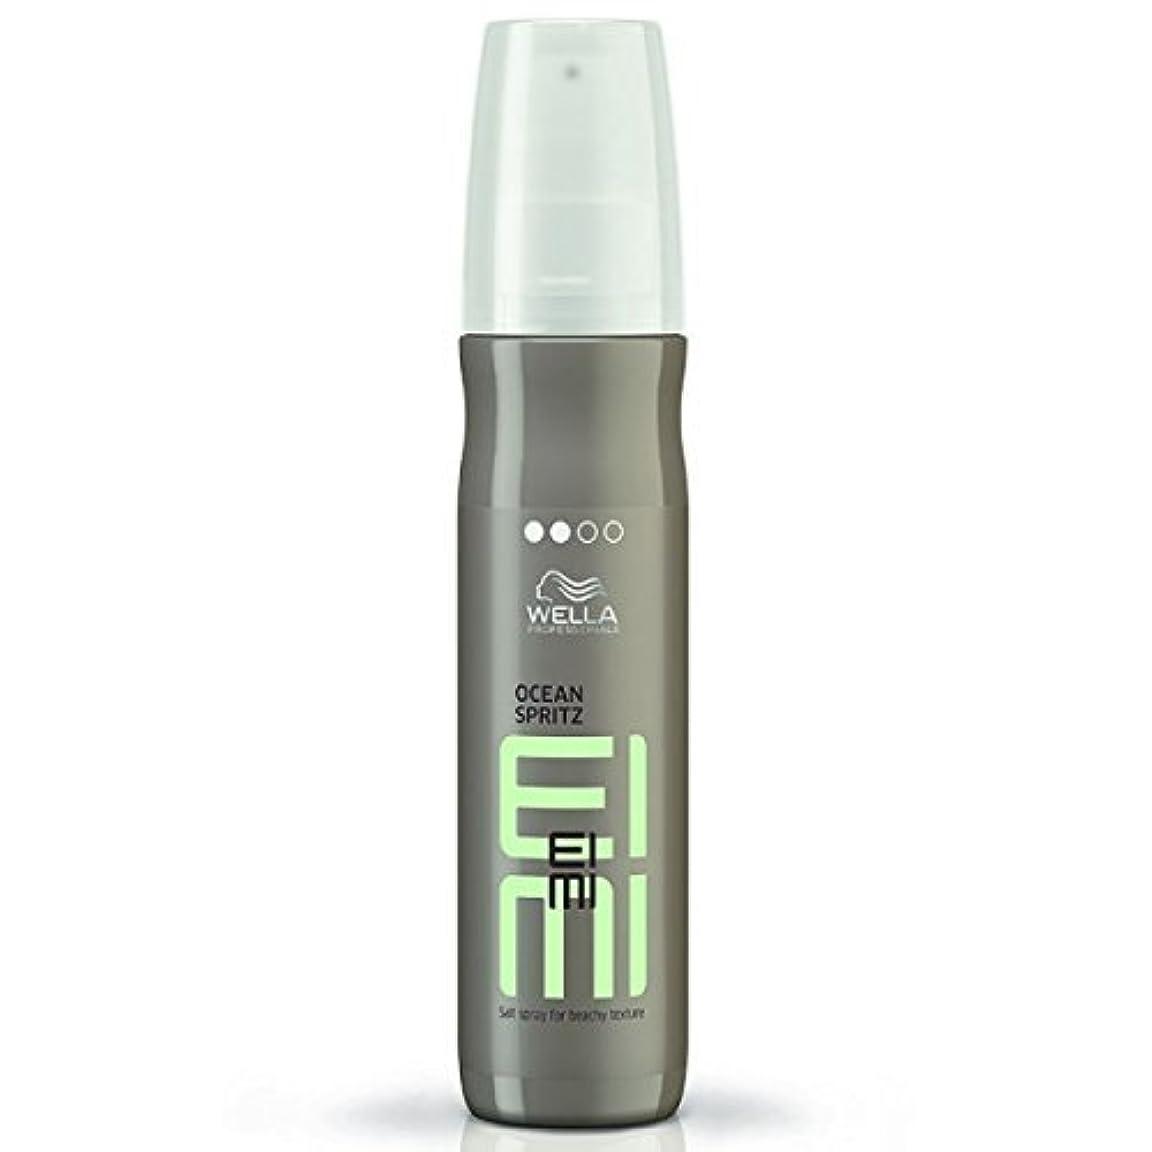 弁護人自然公園オゾンWella EIMI Ocean Spritz - Salt Spray For Beachy Hair Texture 150 ml [並行輸入品]